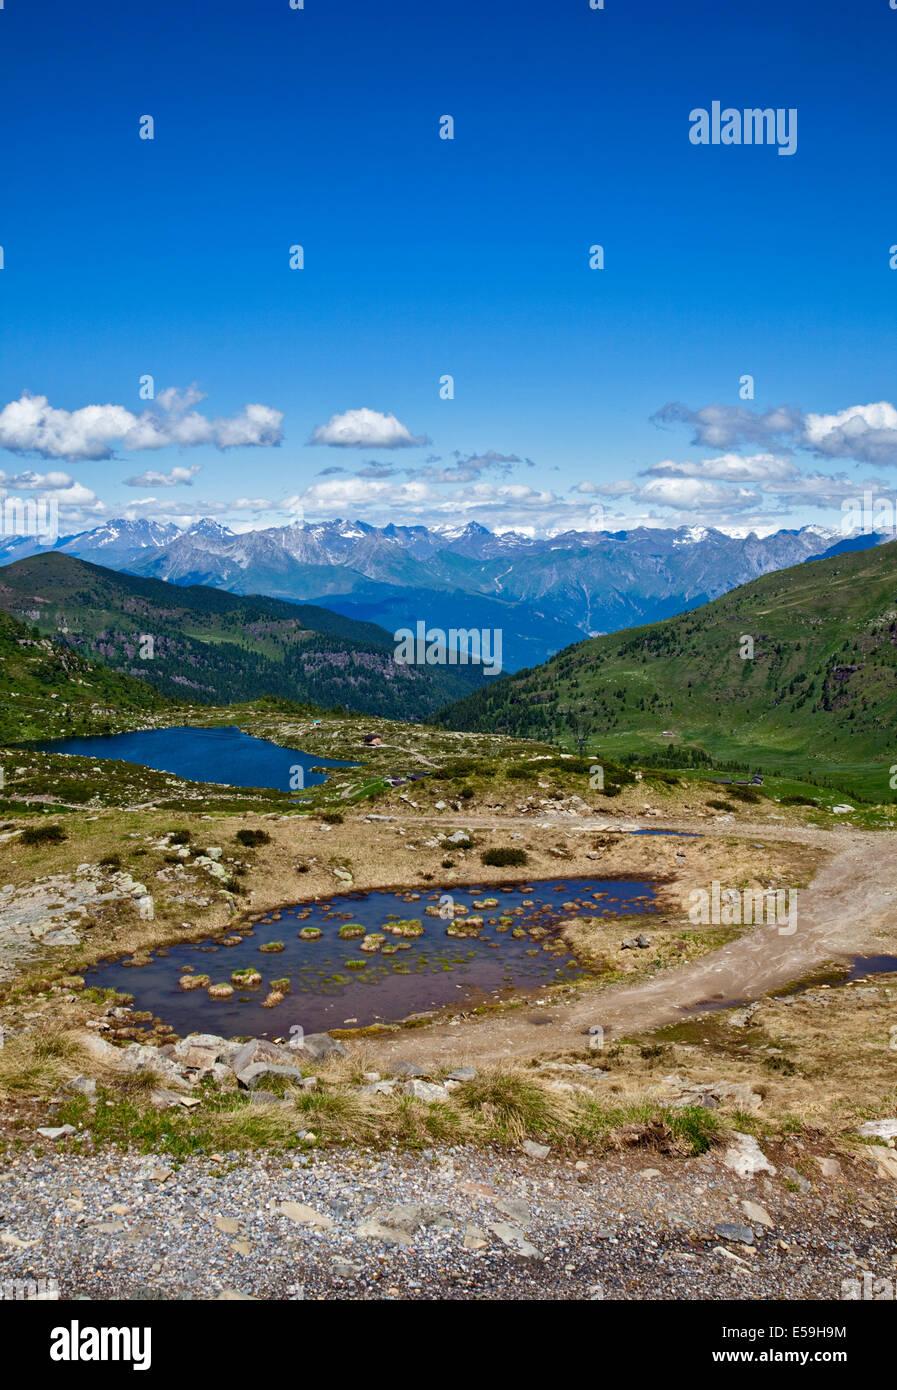 Laghetto di Dasdana/Lake Dasdana from Dasdana Pass, near Bagolino, Italy - Stock Image